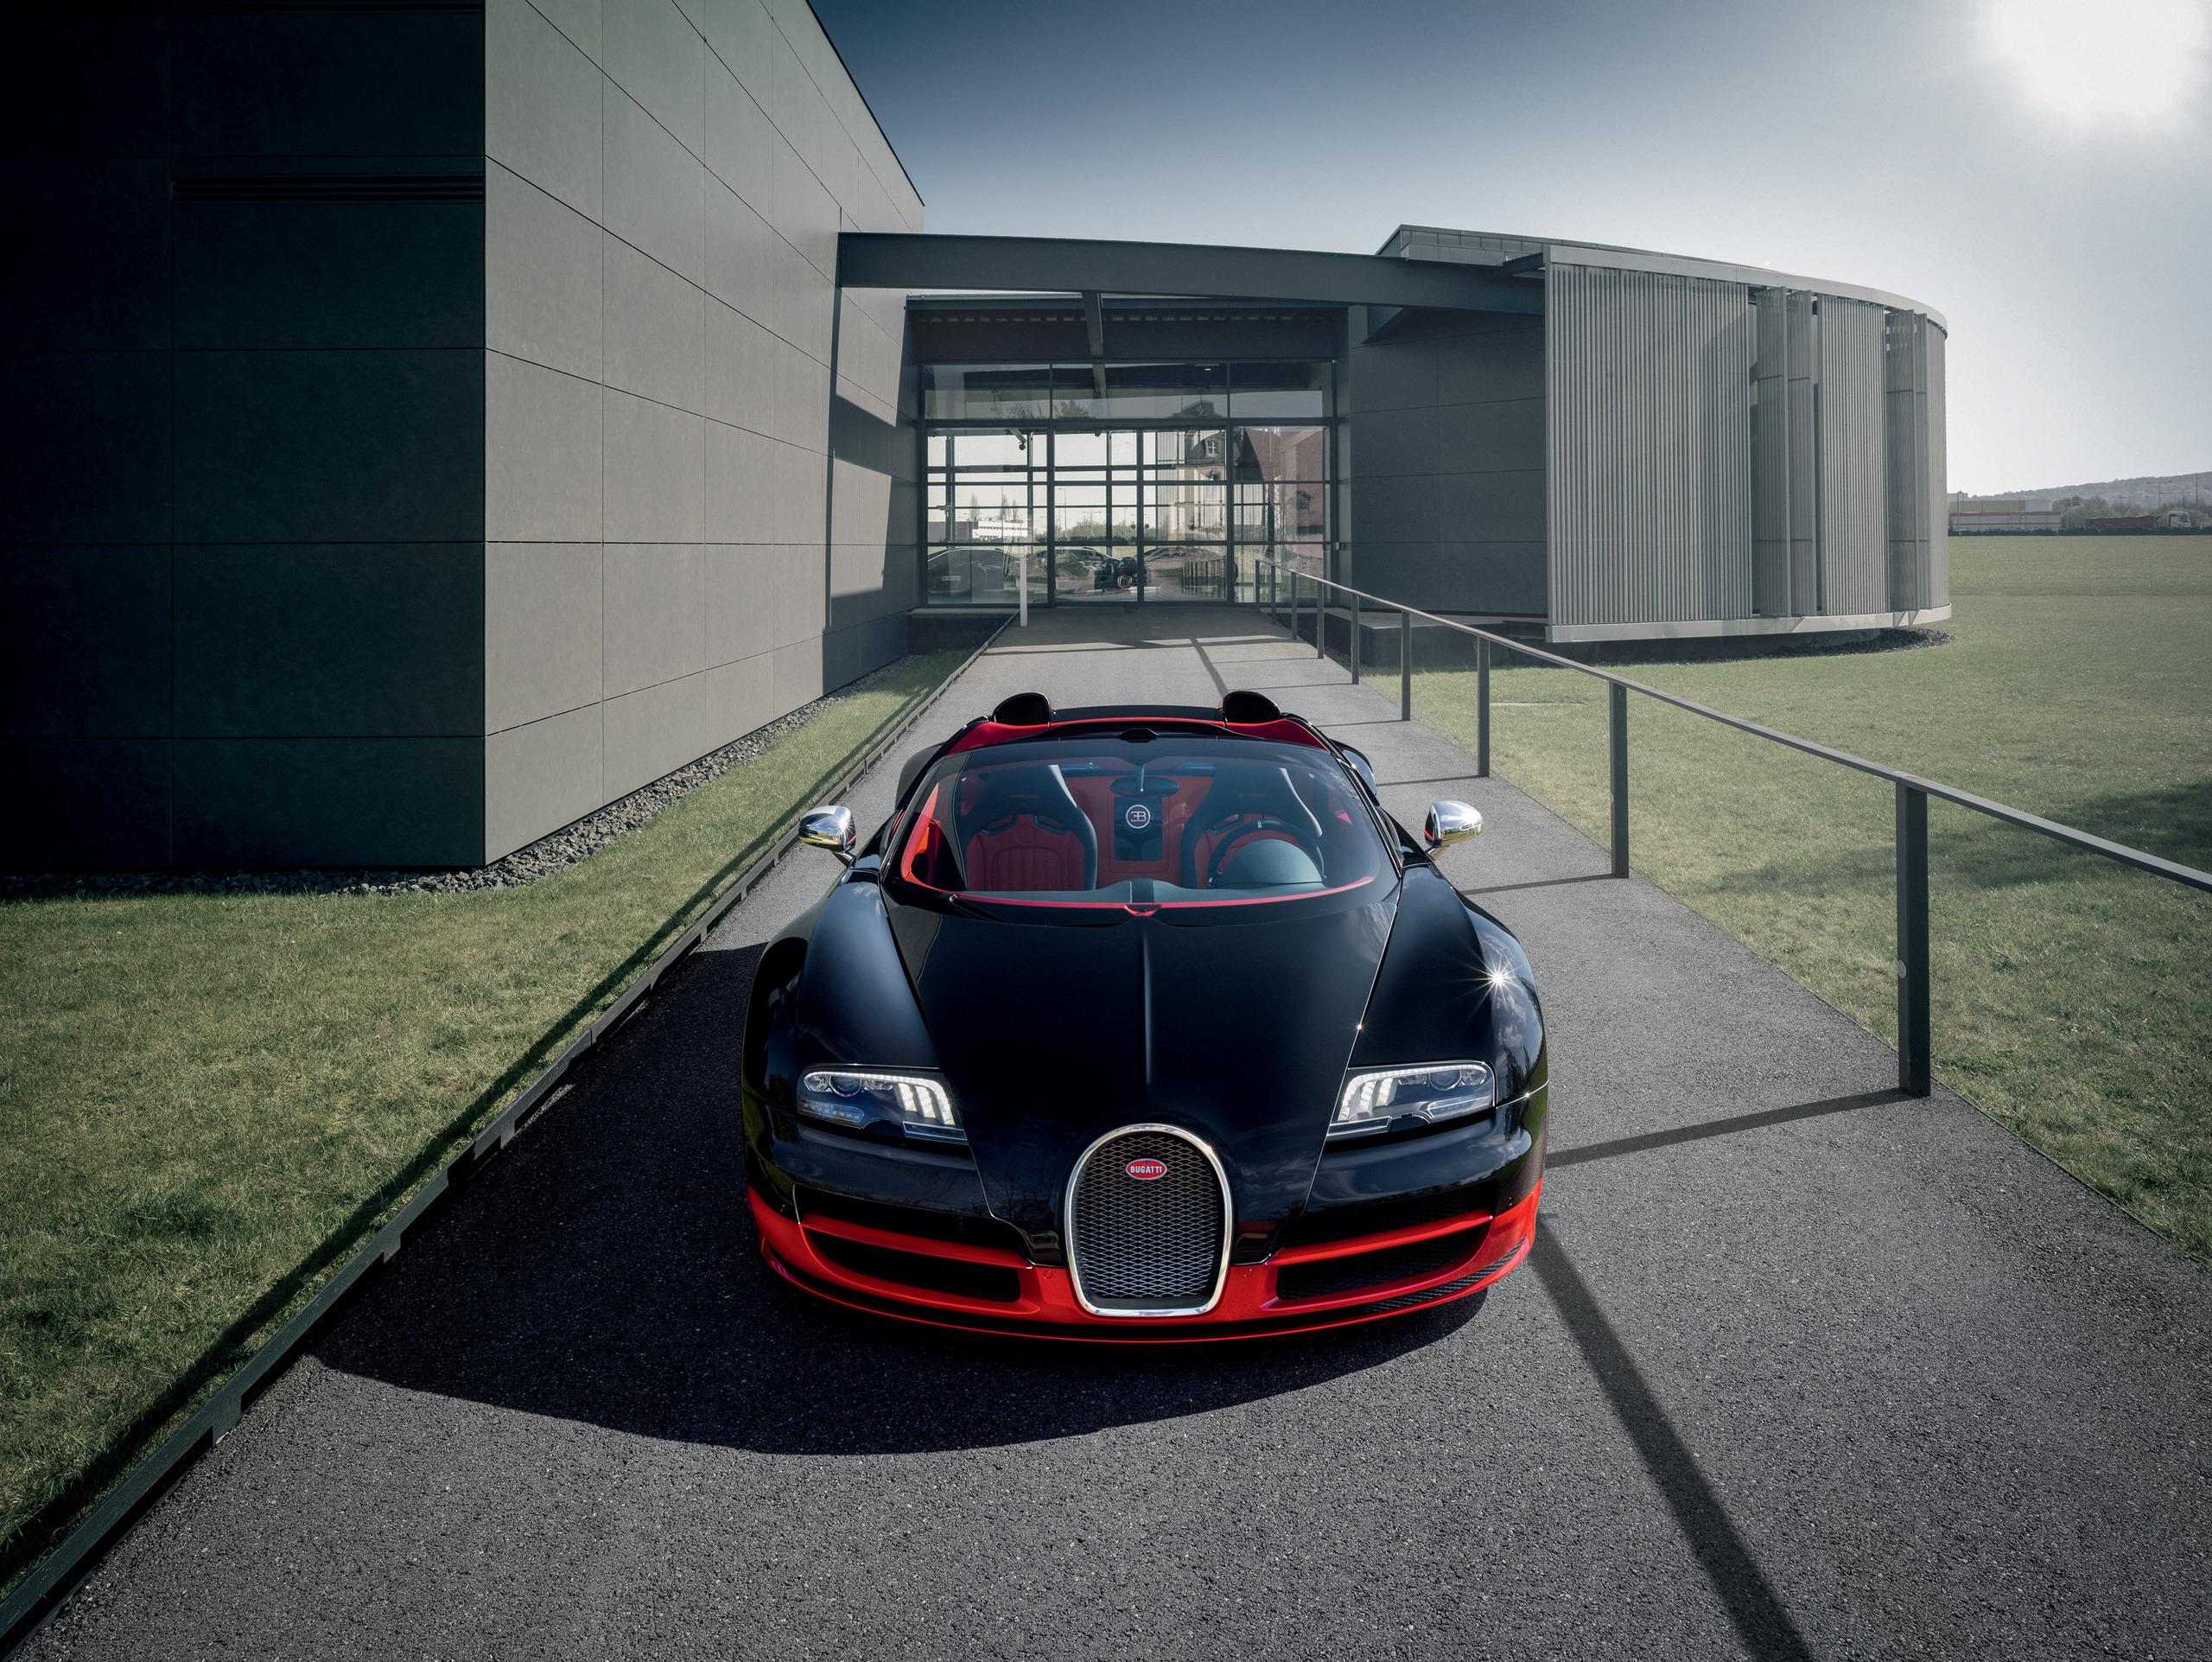 bugatti veyron 16 4 grand sport vitesse roadster sports cars photo 3200480. Black Bedroom Furniture Sets. Home Design Ideas